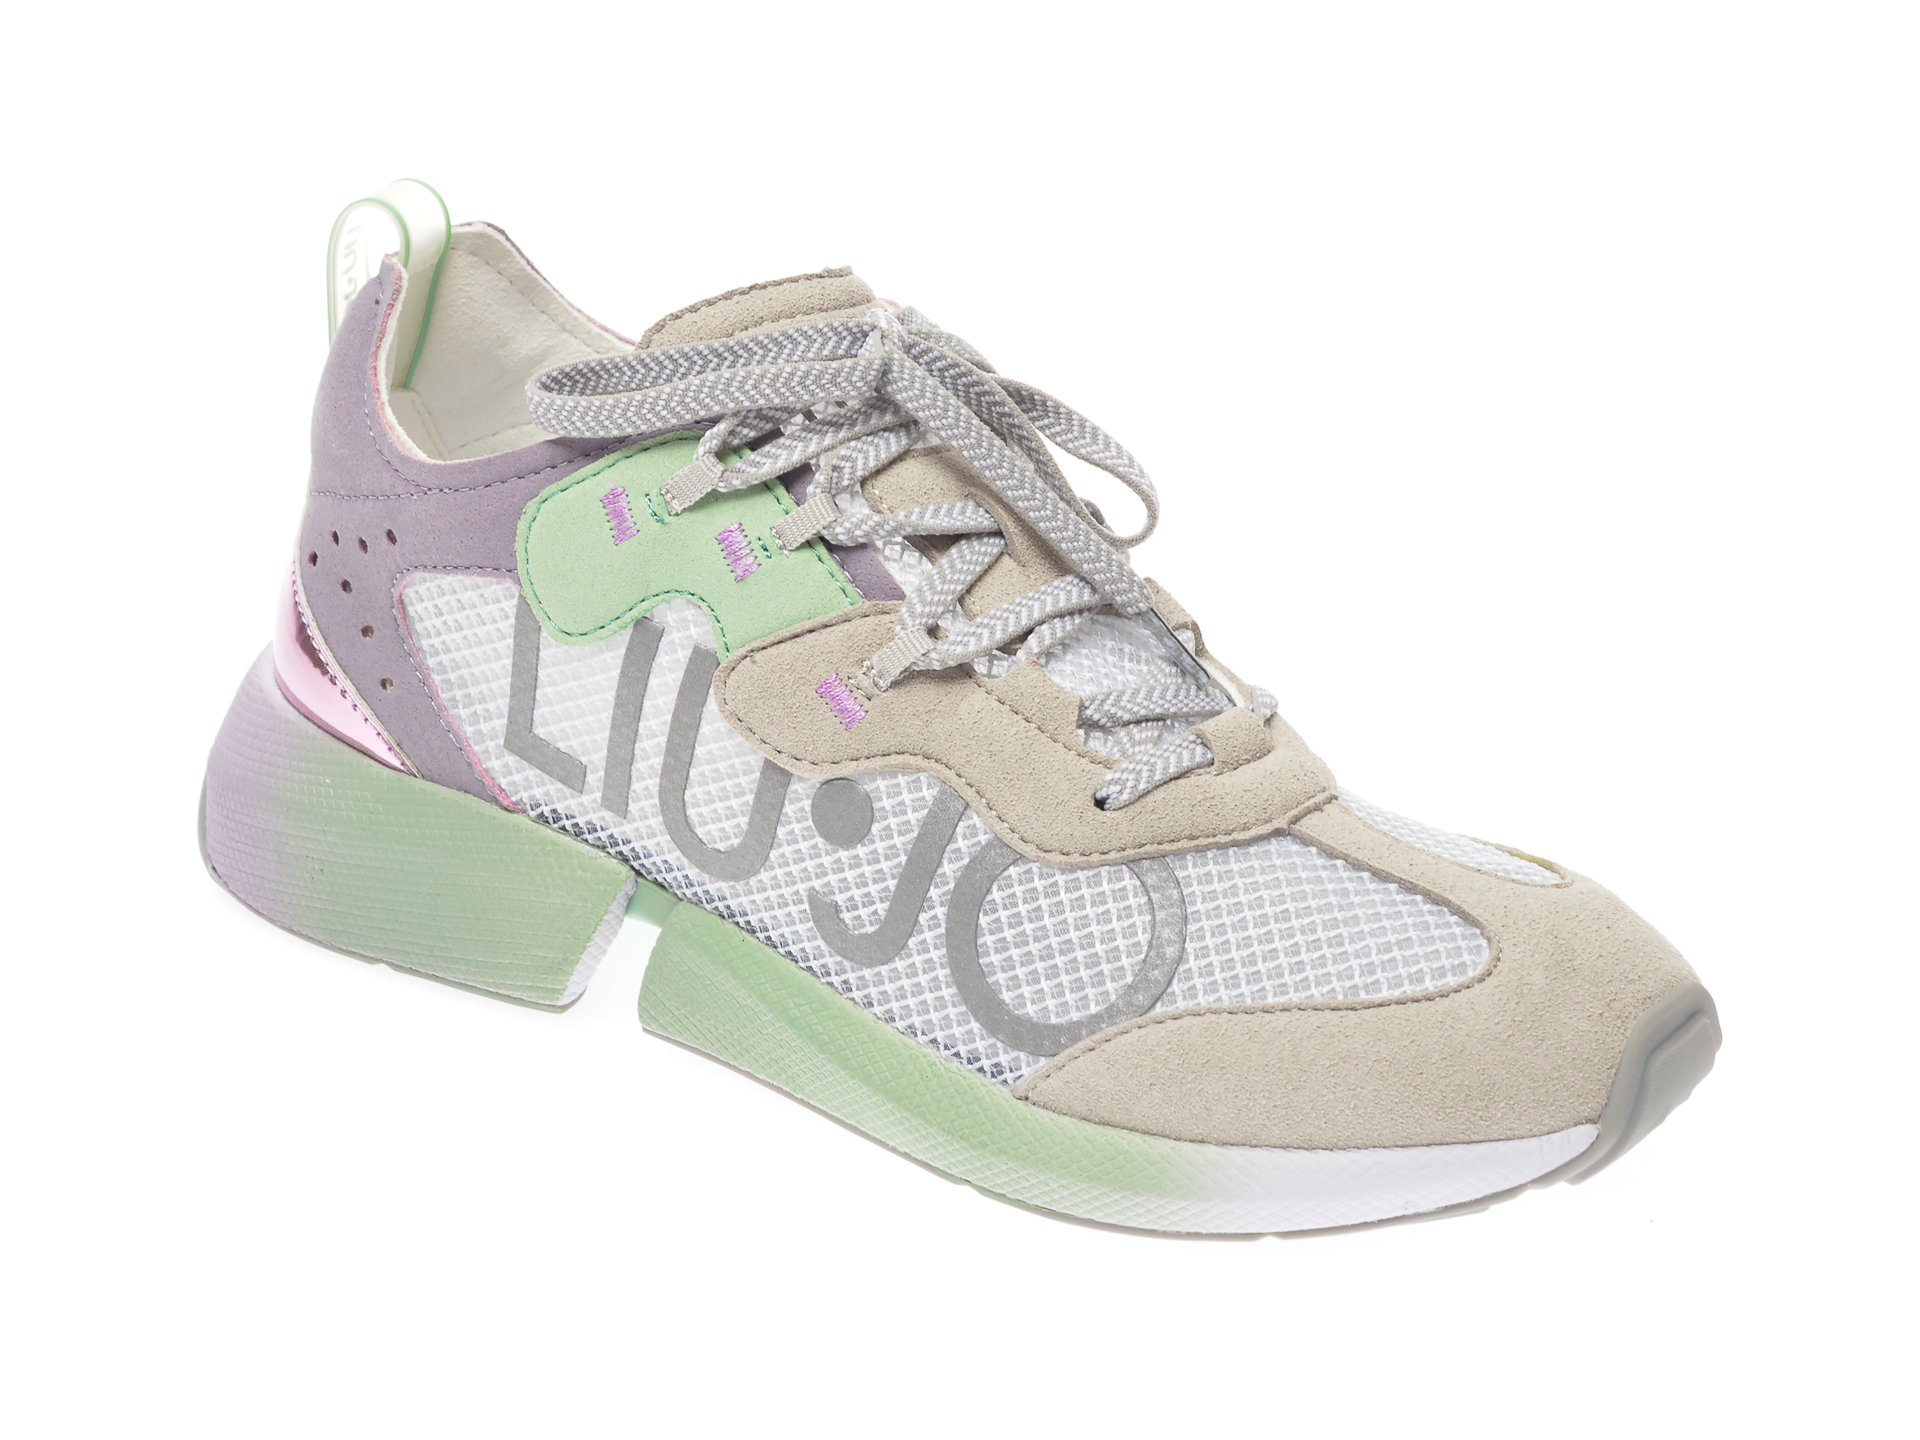 Pantofi sport LIU JO gri, YULIA04, din piele intoarsa